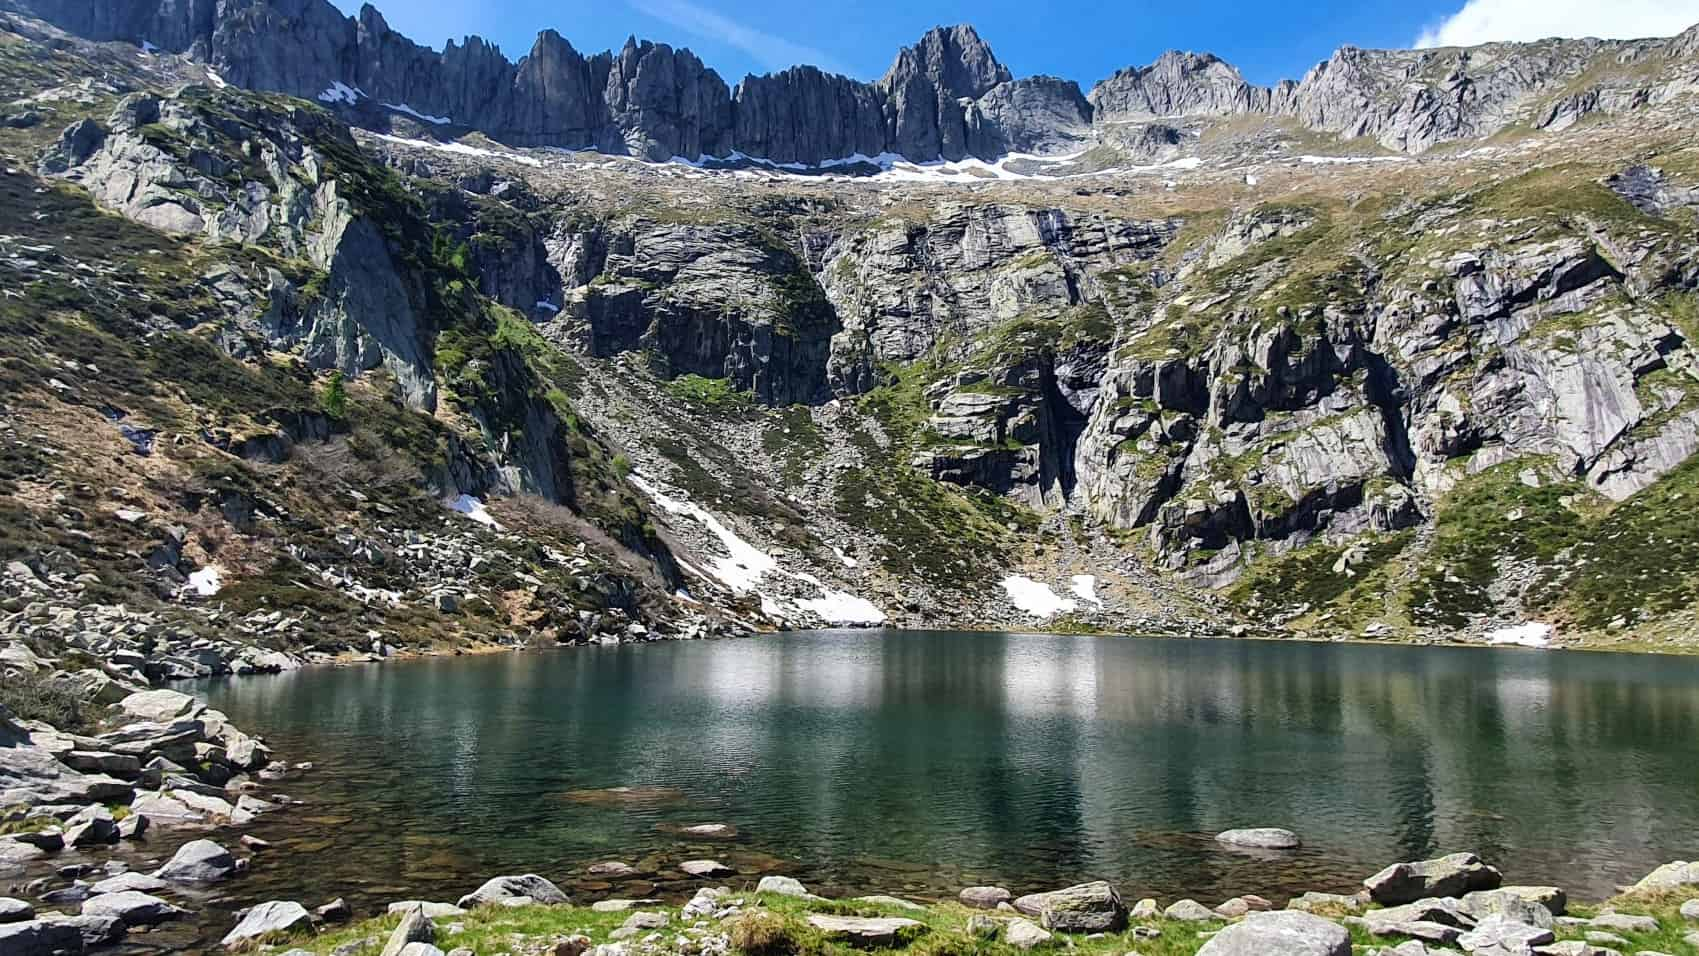 Lago di Darengo e Capanna Como